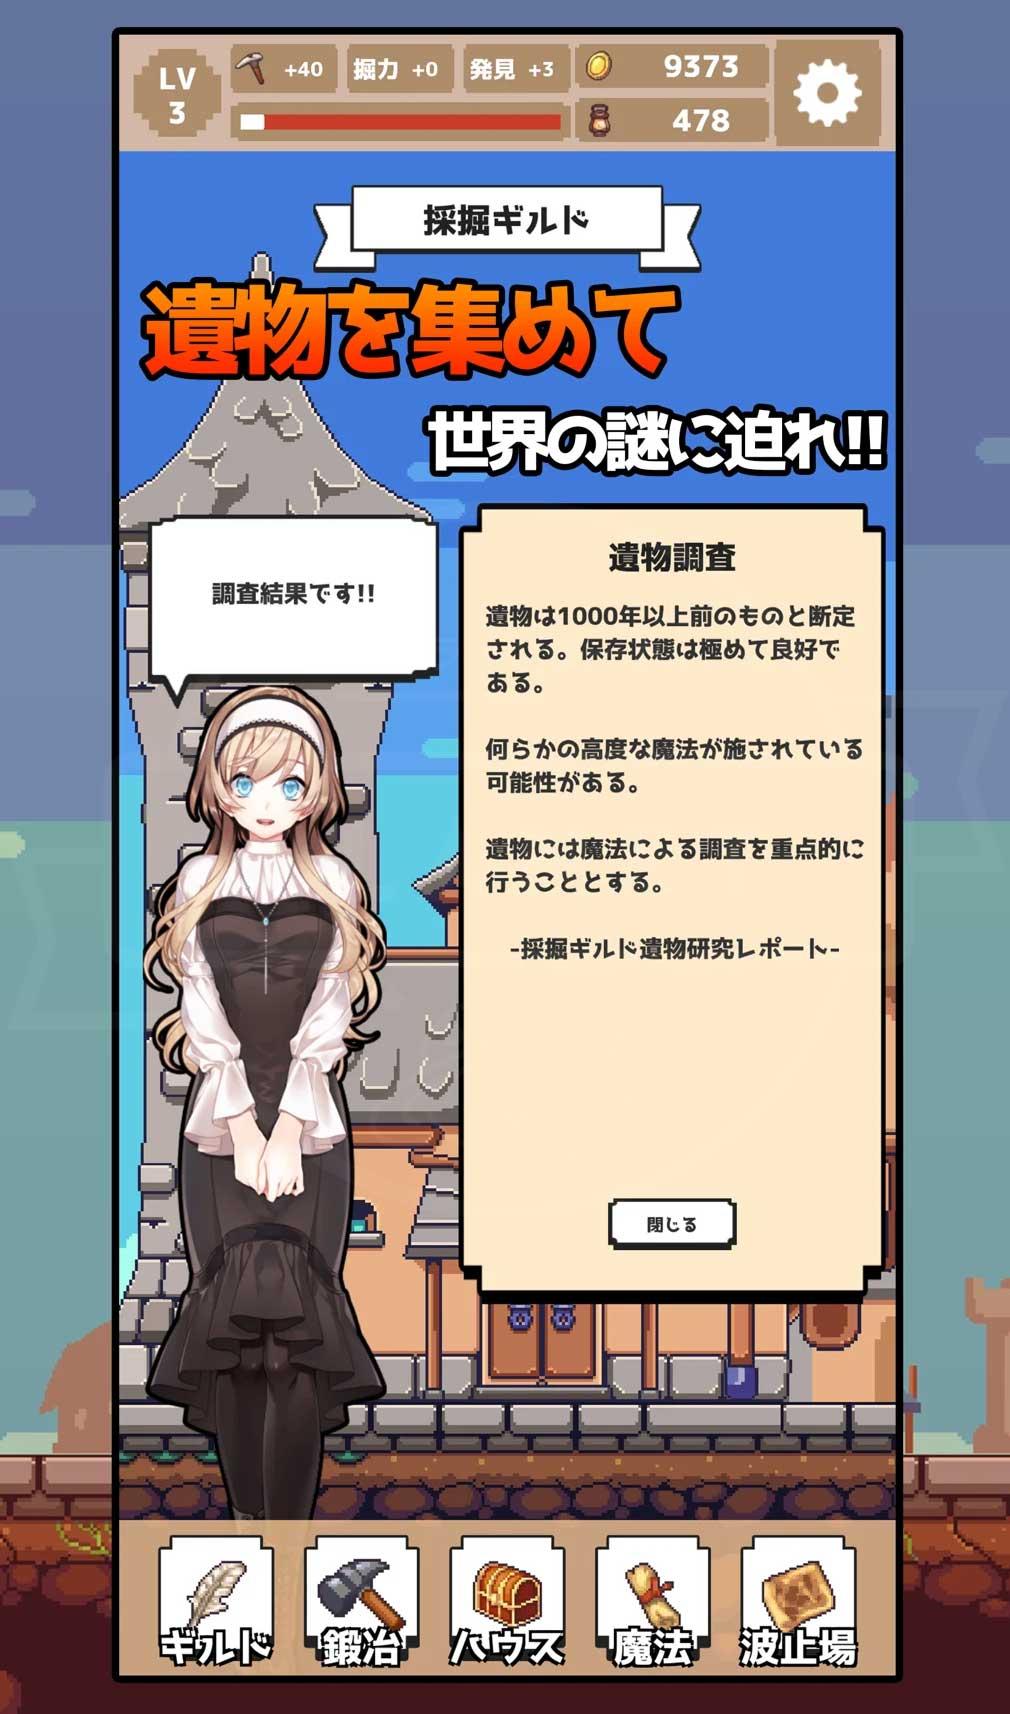 DIG DIG DIG 採掘ギルド『遺物調査』紹介イメージ